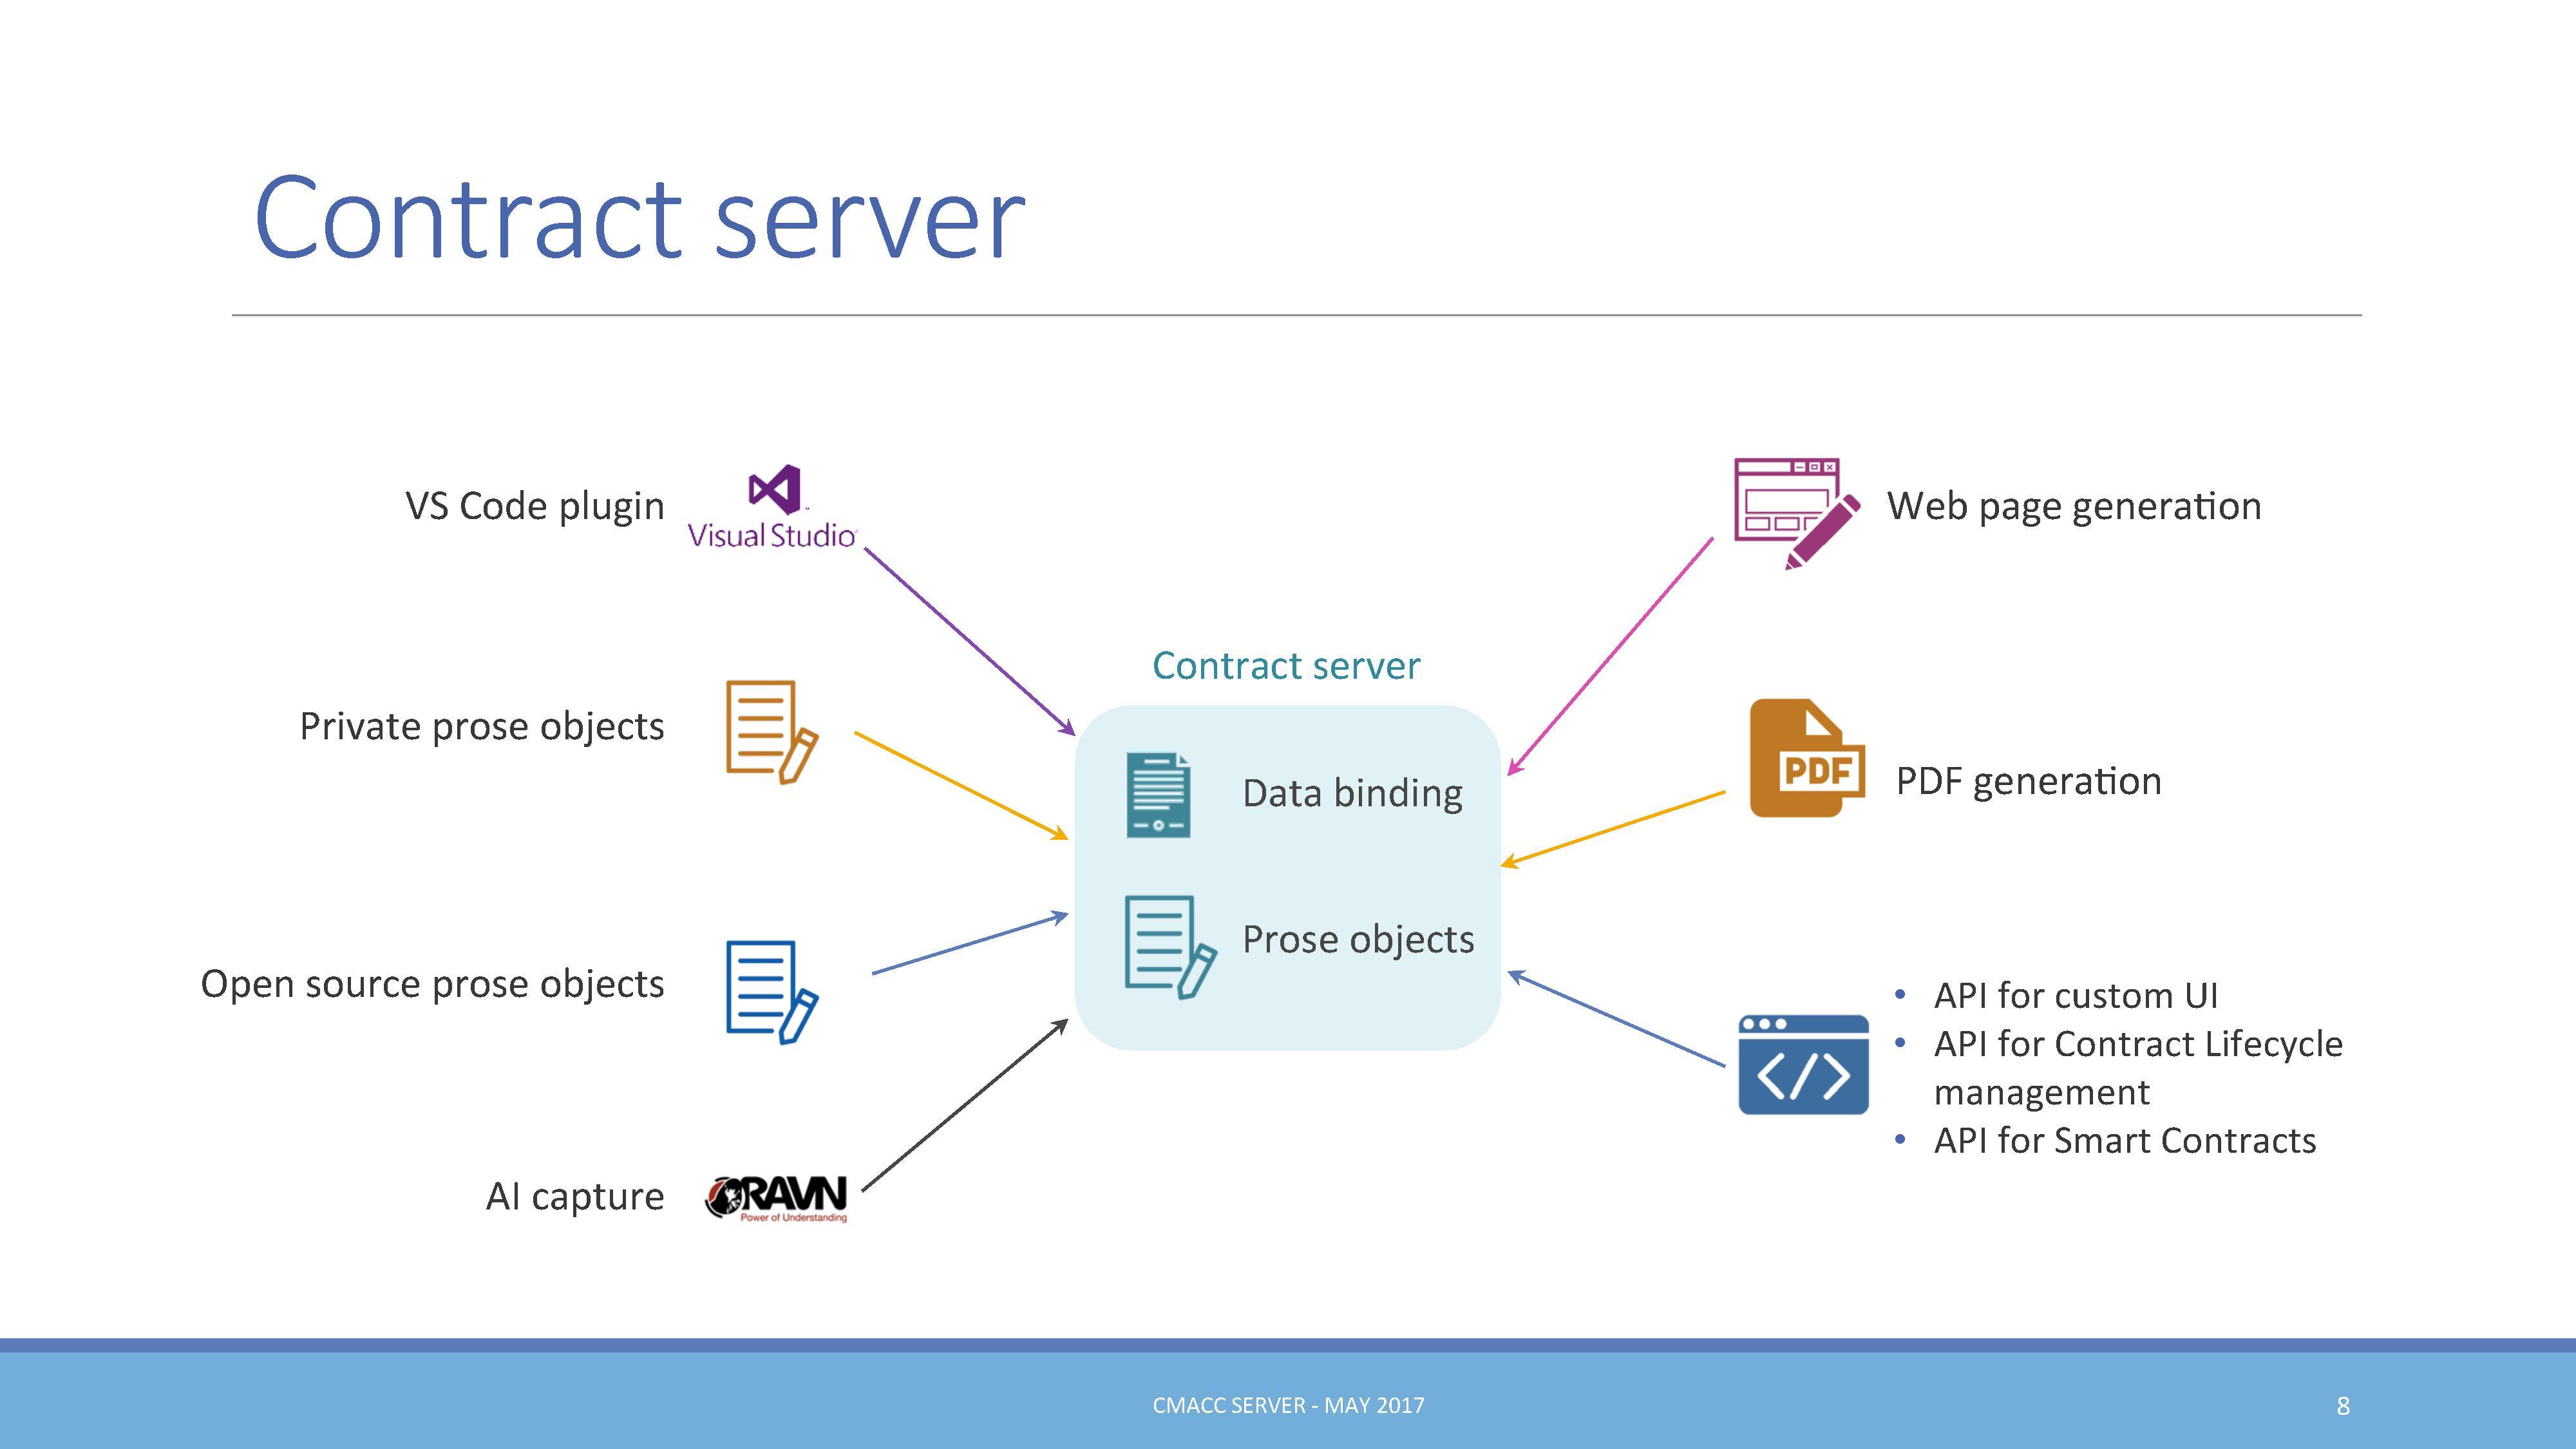 Cmacc - GDPR server EN - 20170606 - 8/15